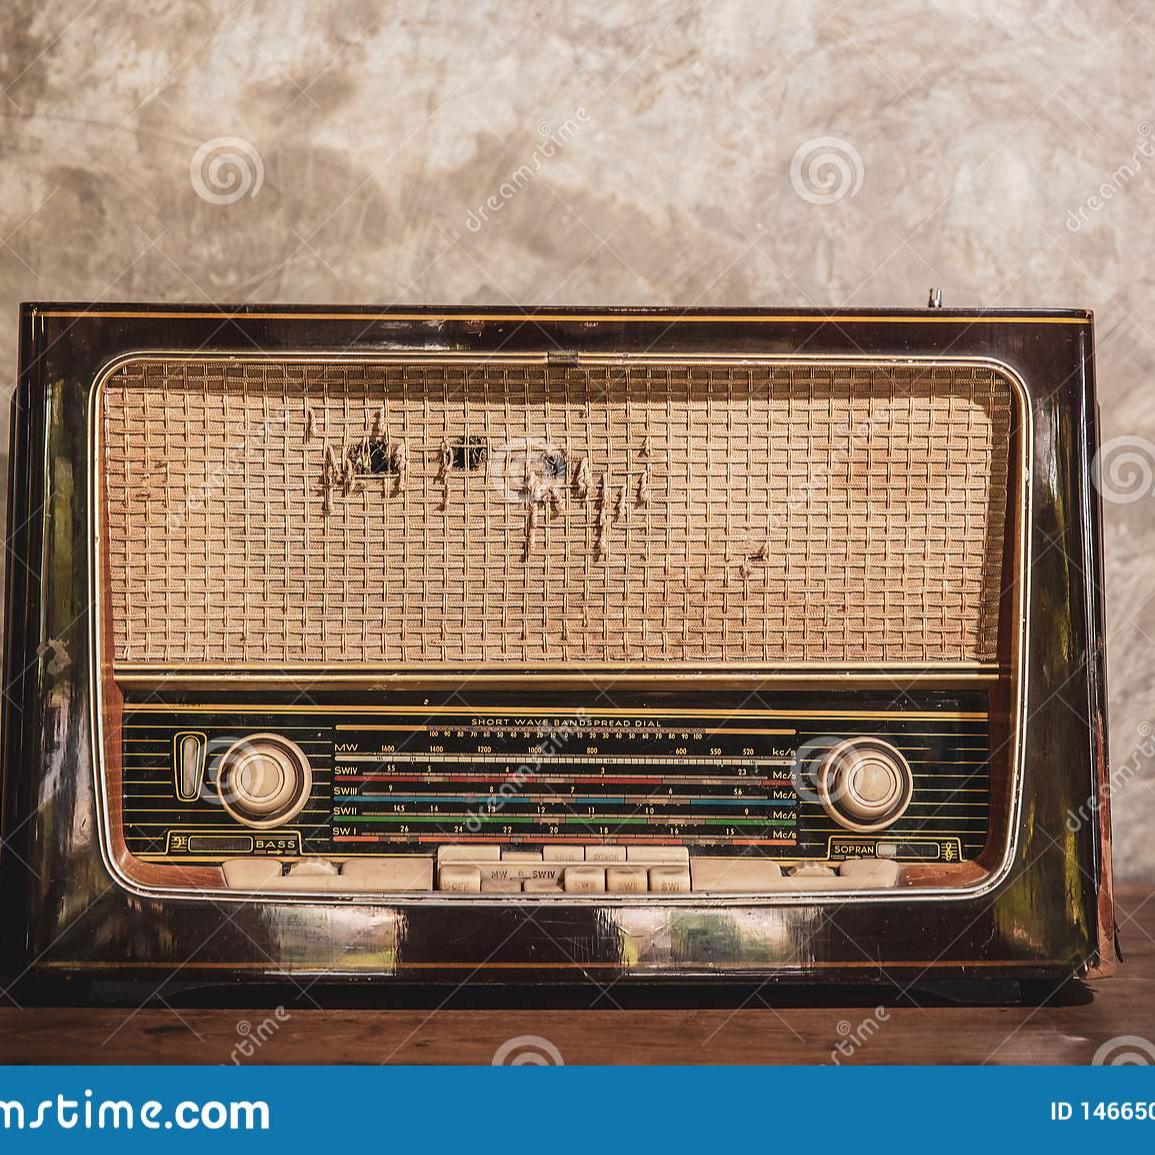 99.3 JAMZ FM